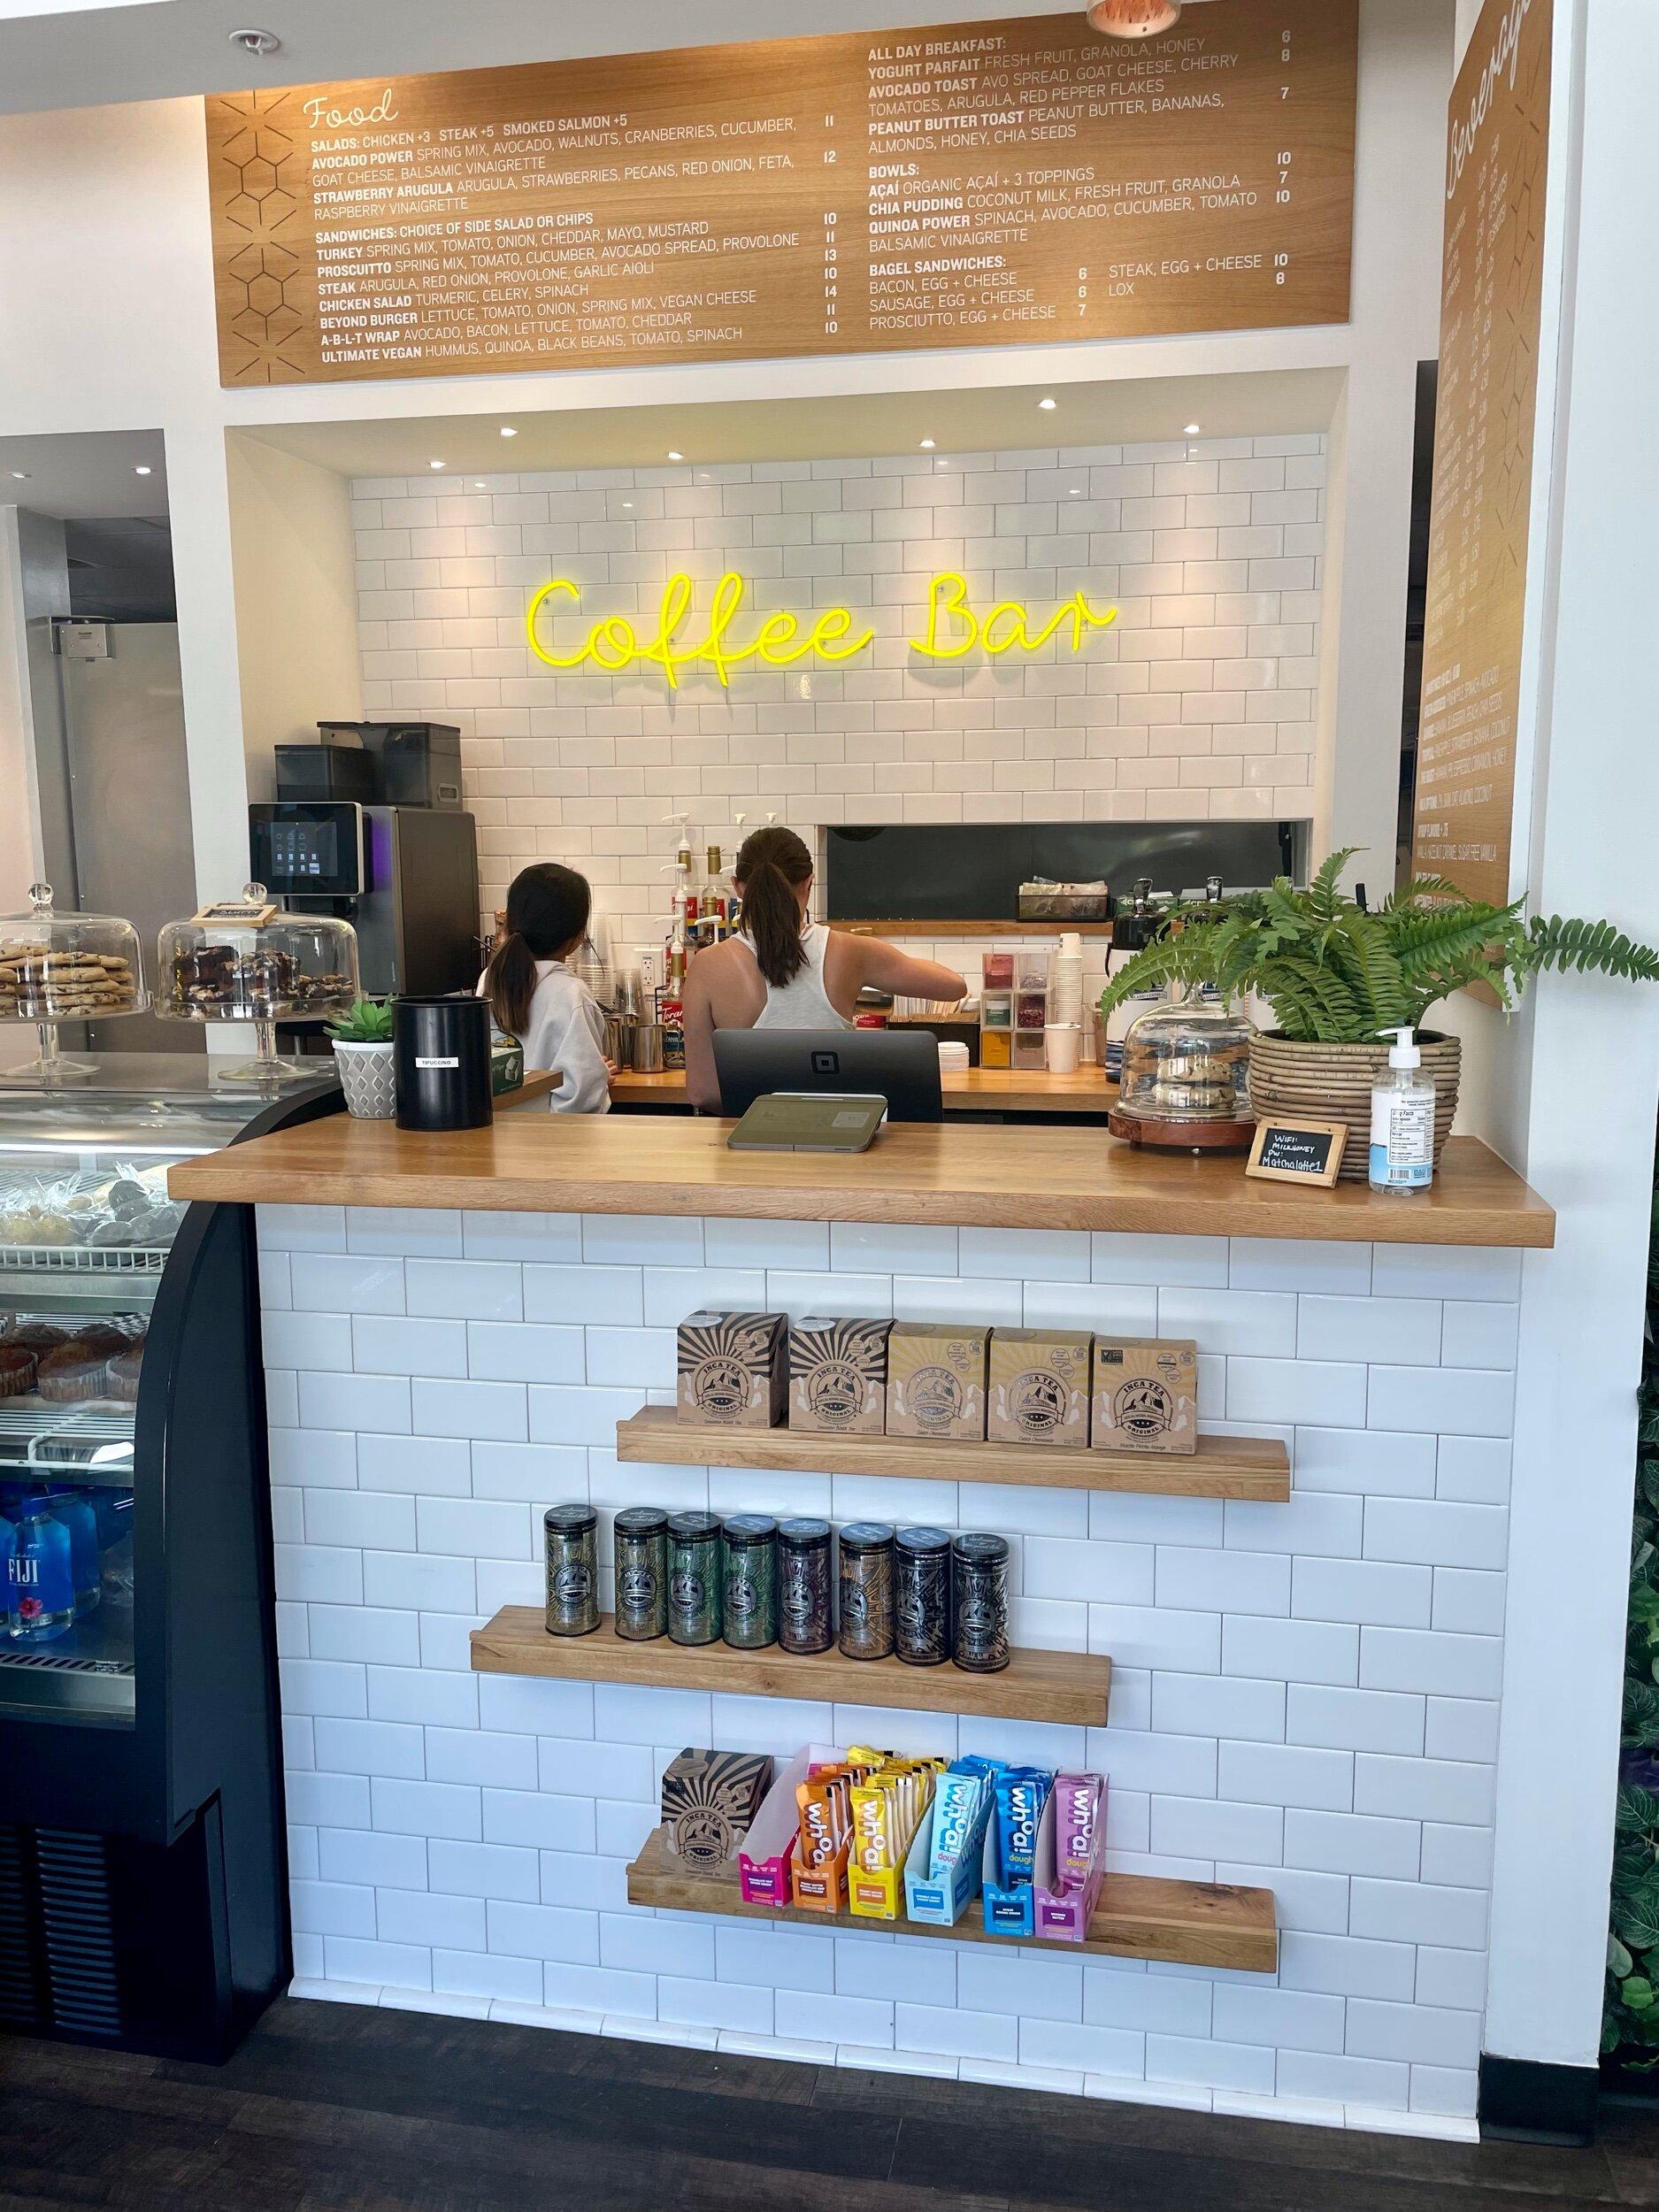 Milk + Honey Cafe — JO DIFRANCO